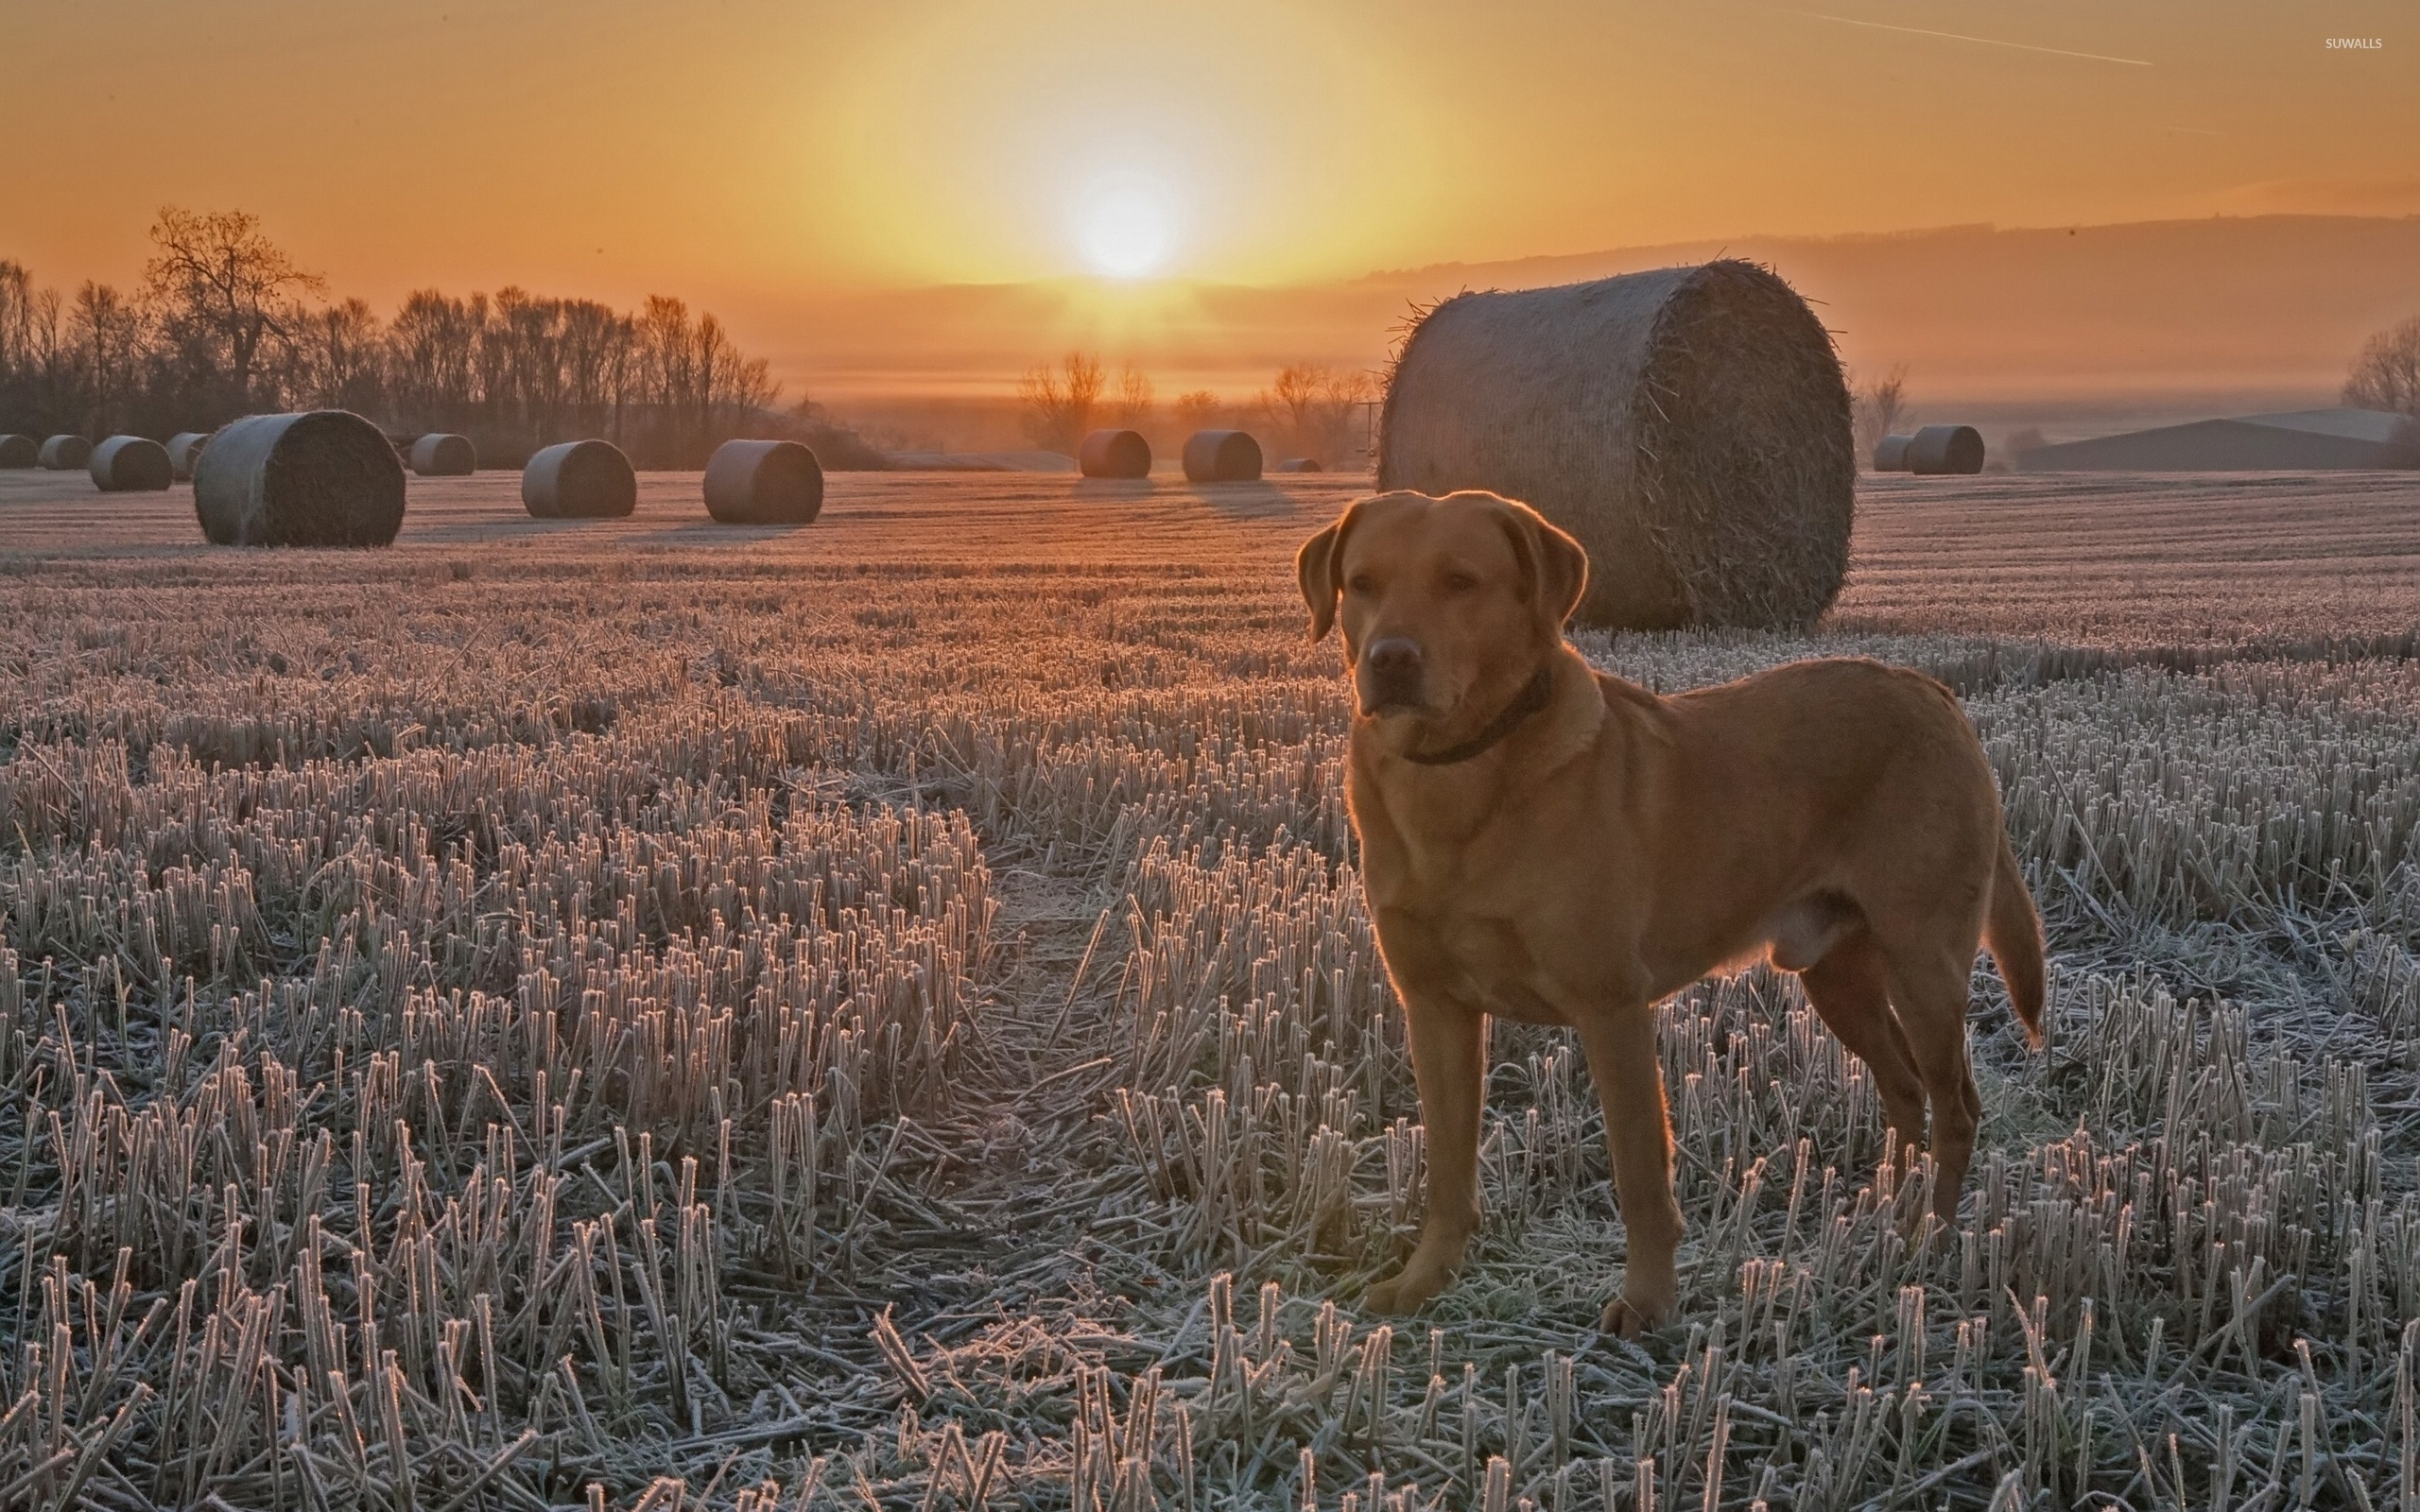 Dog at sunset wallpaper - Animal wallpapers - #47051